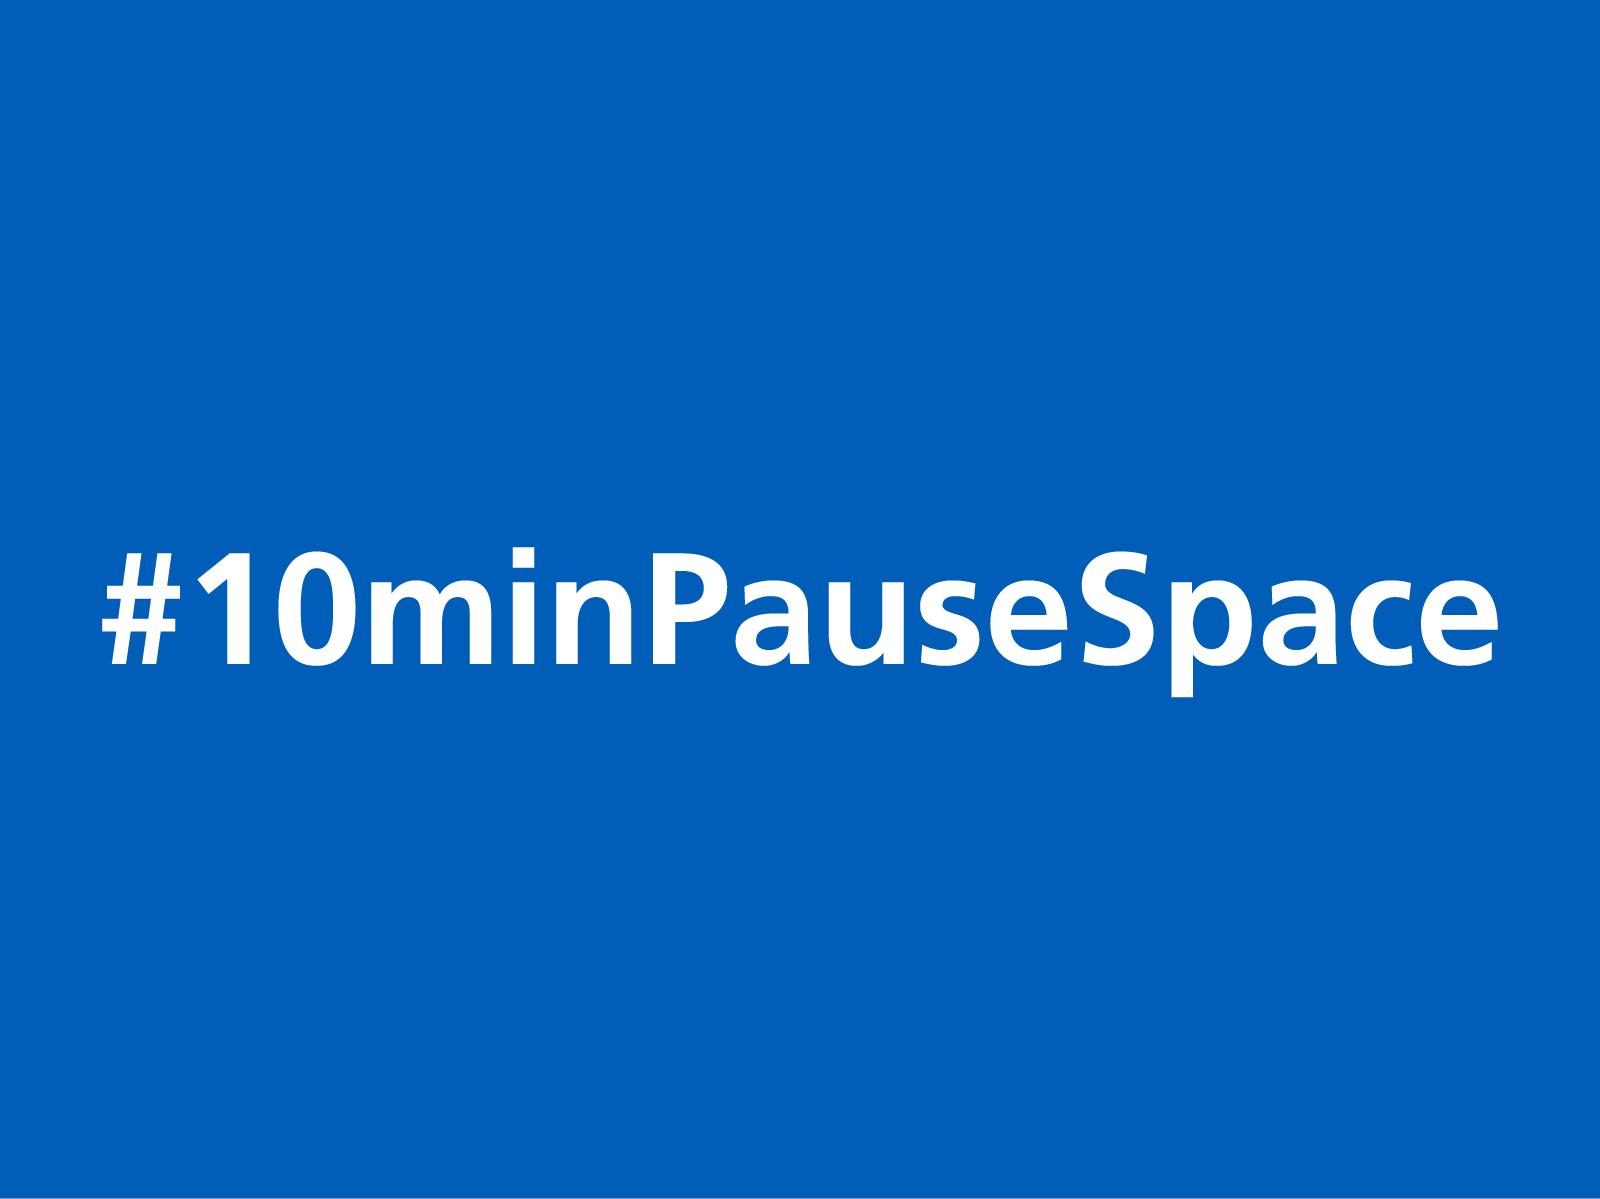 #10minPausespace tag